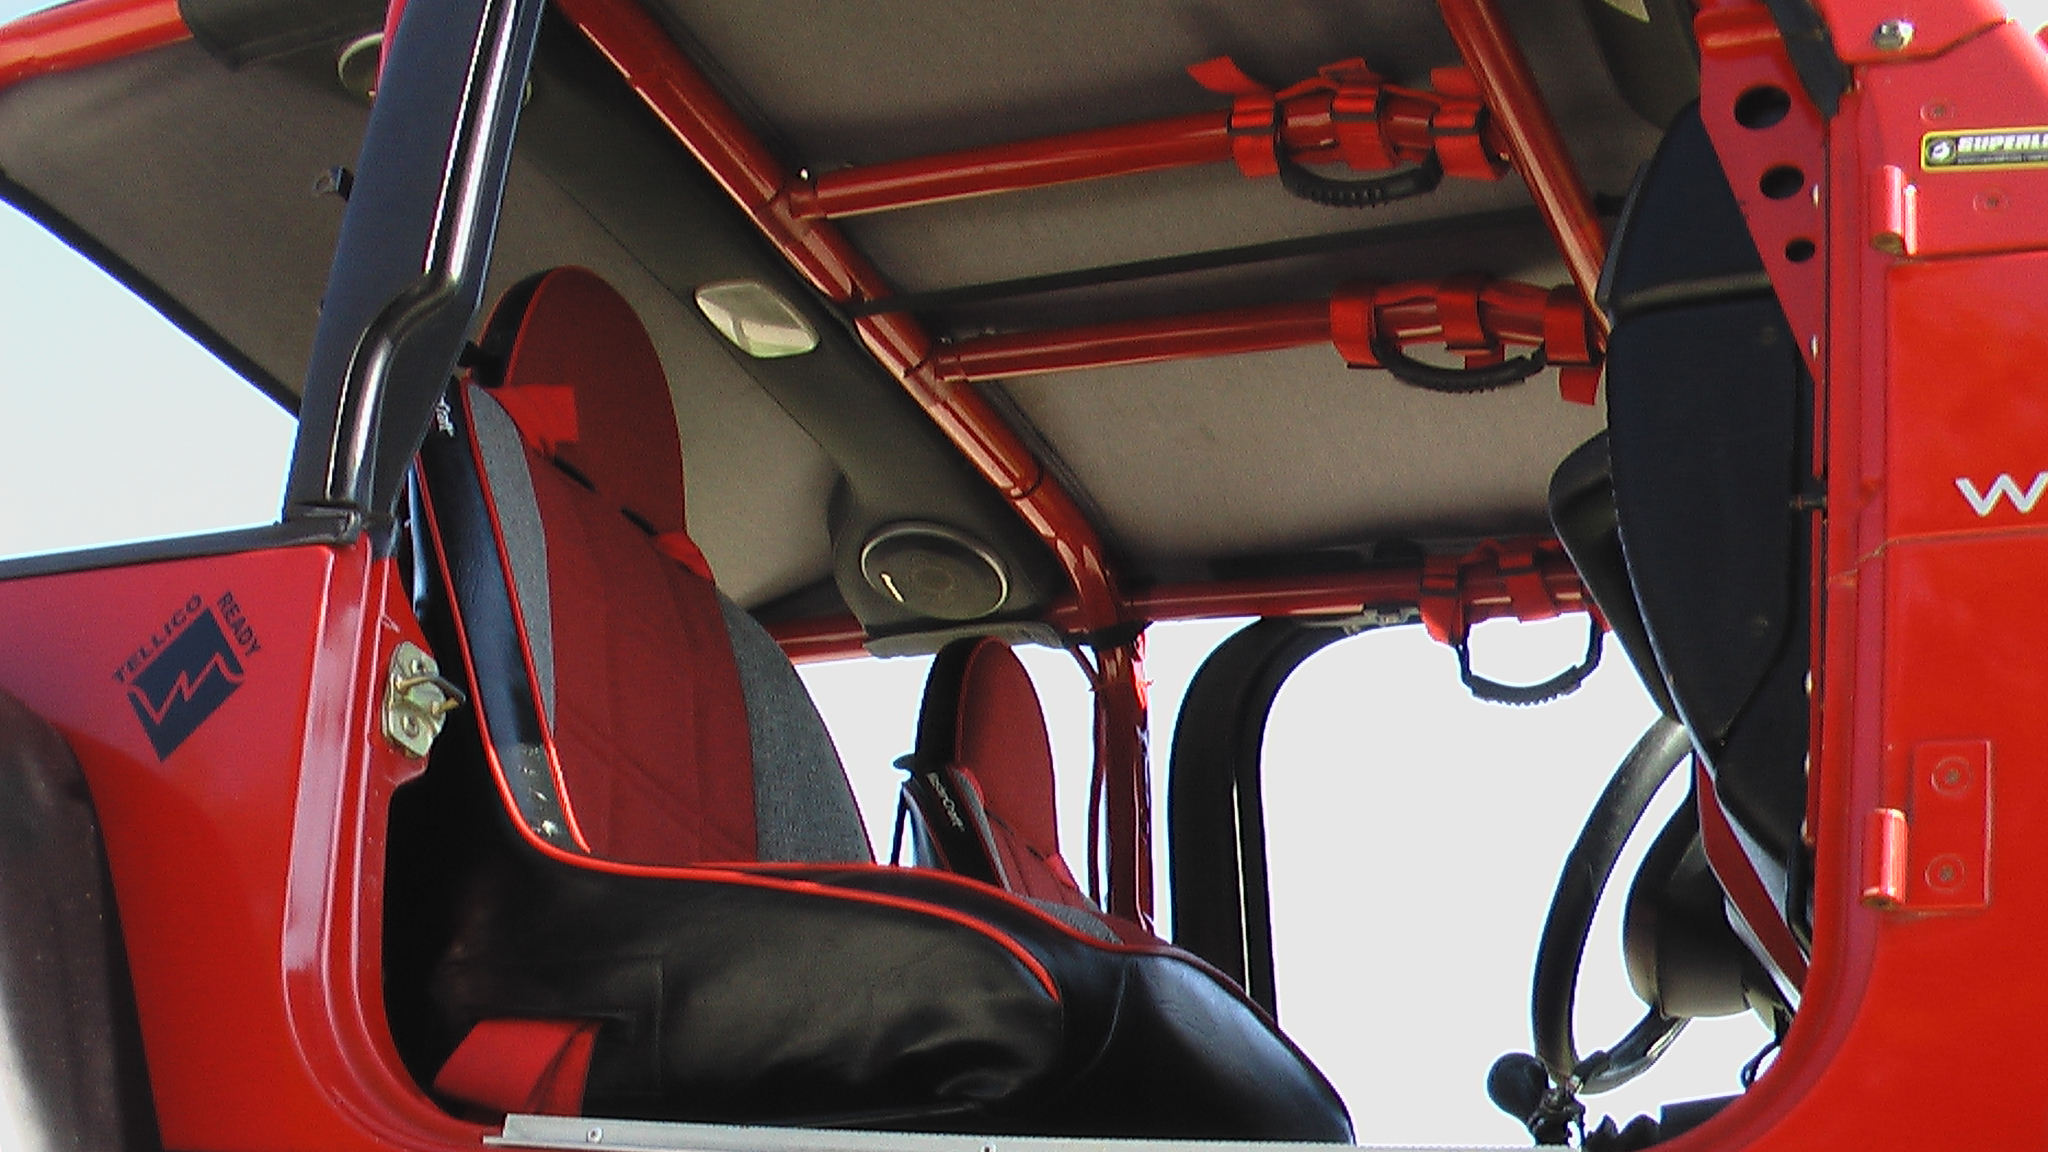 Mastercraft Rubicon or Corbeau Baja RS Seats? - JeepForum com